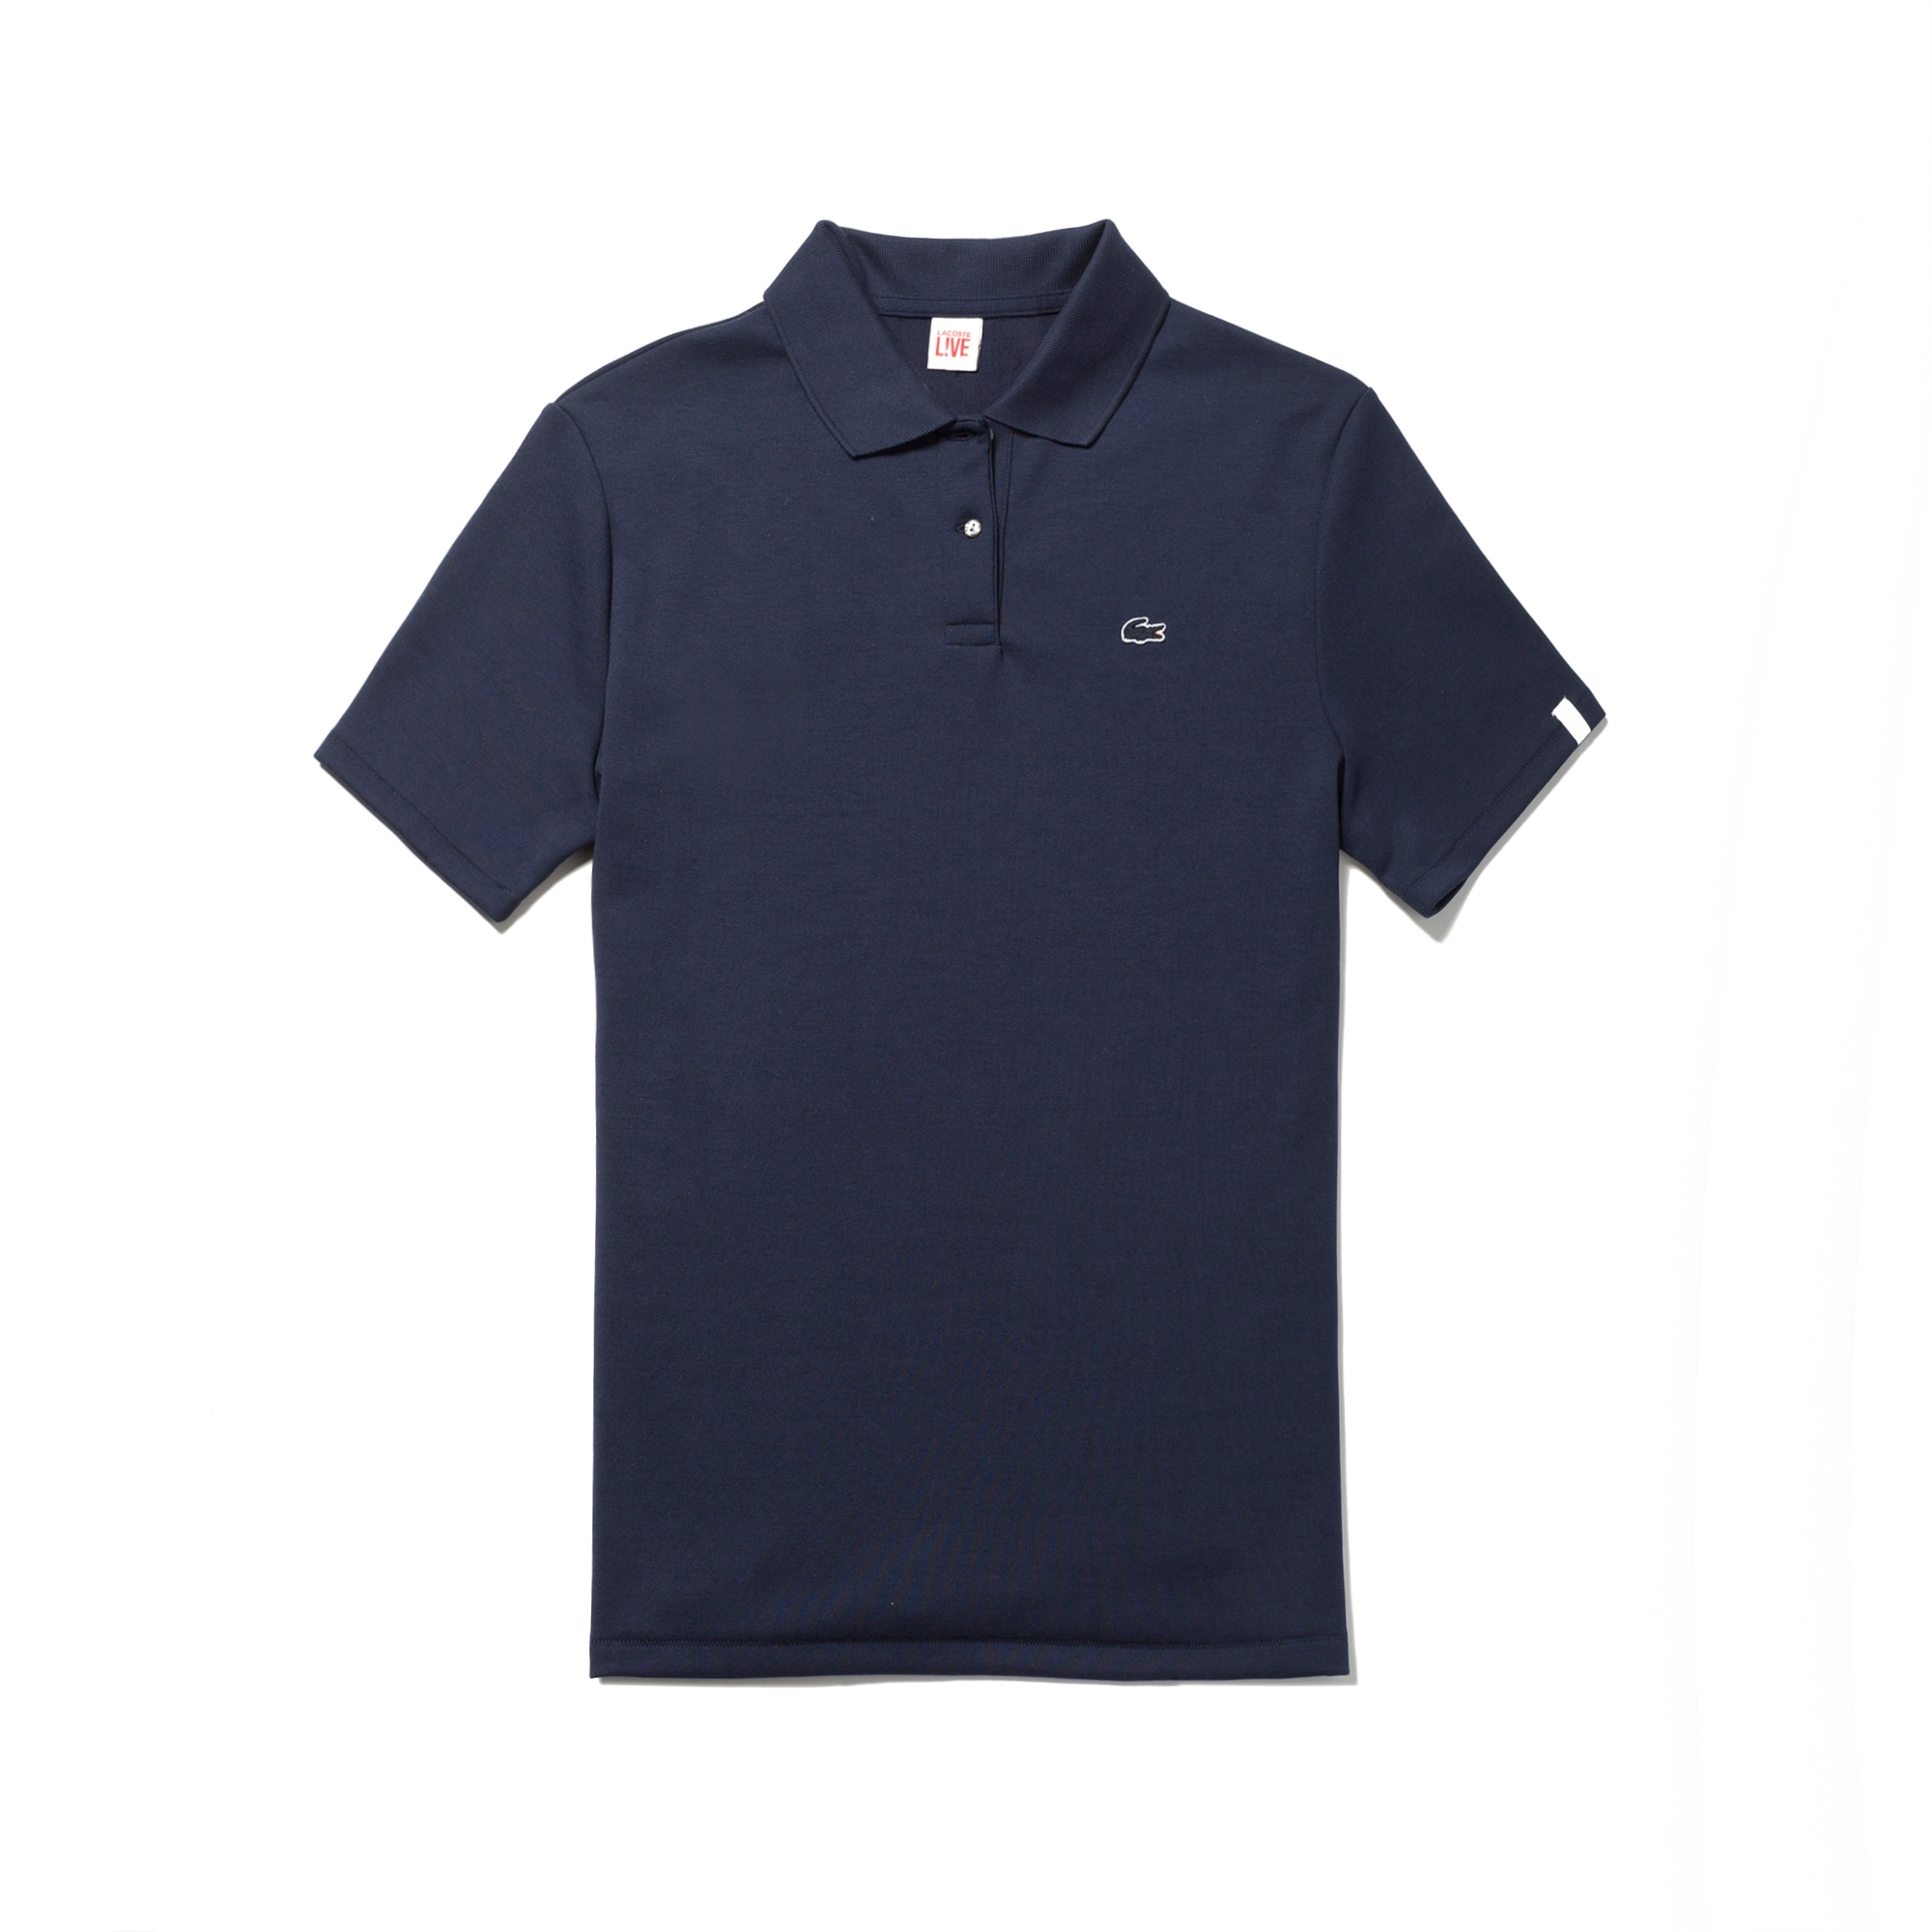 Women's L!VE Back Zip Polo Shirt